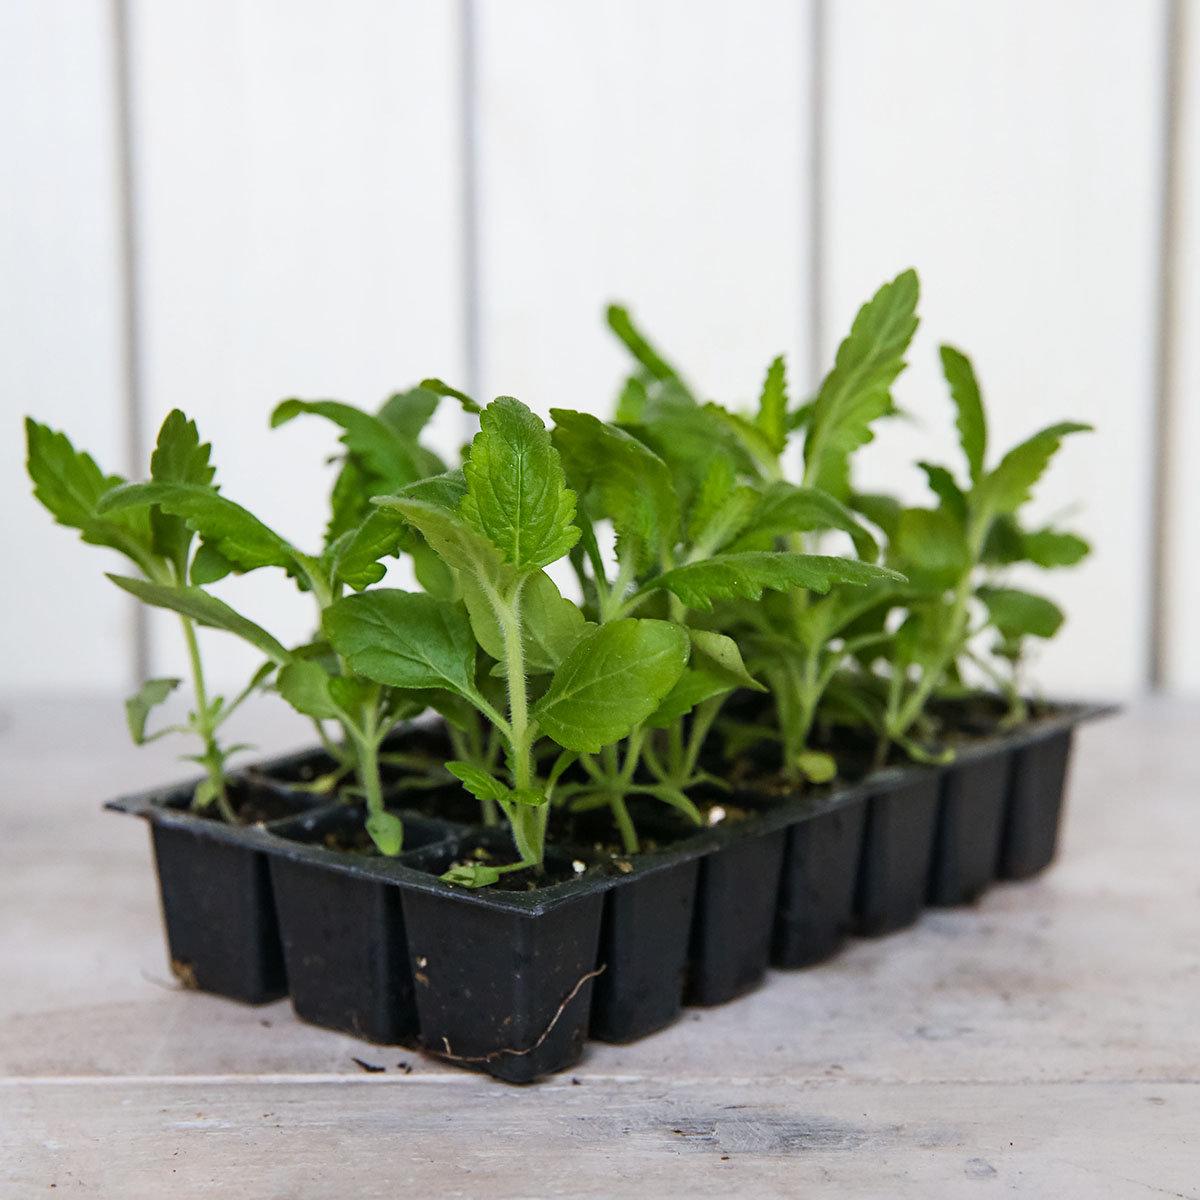 Mini-Jungpflanzen Verbenen Quartz-Mischung   #3